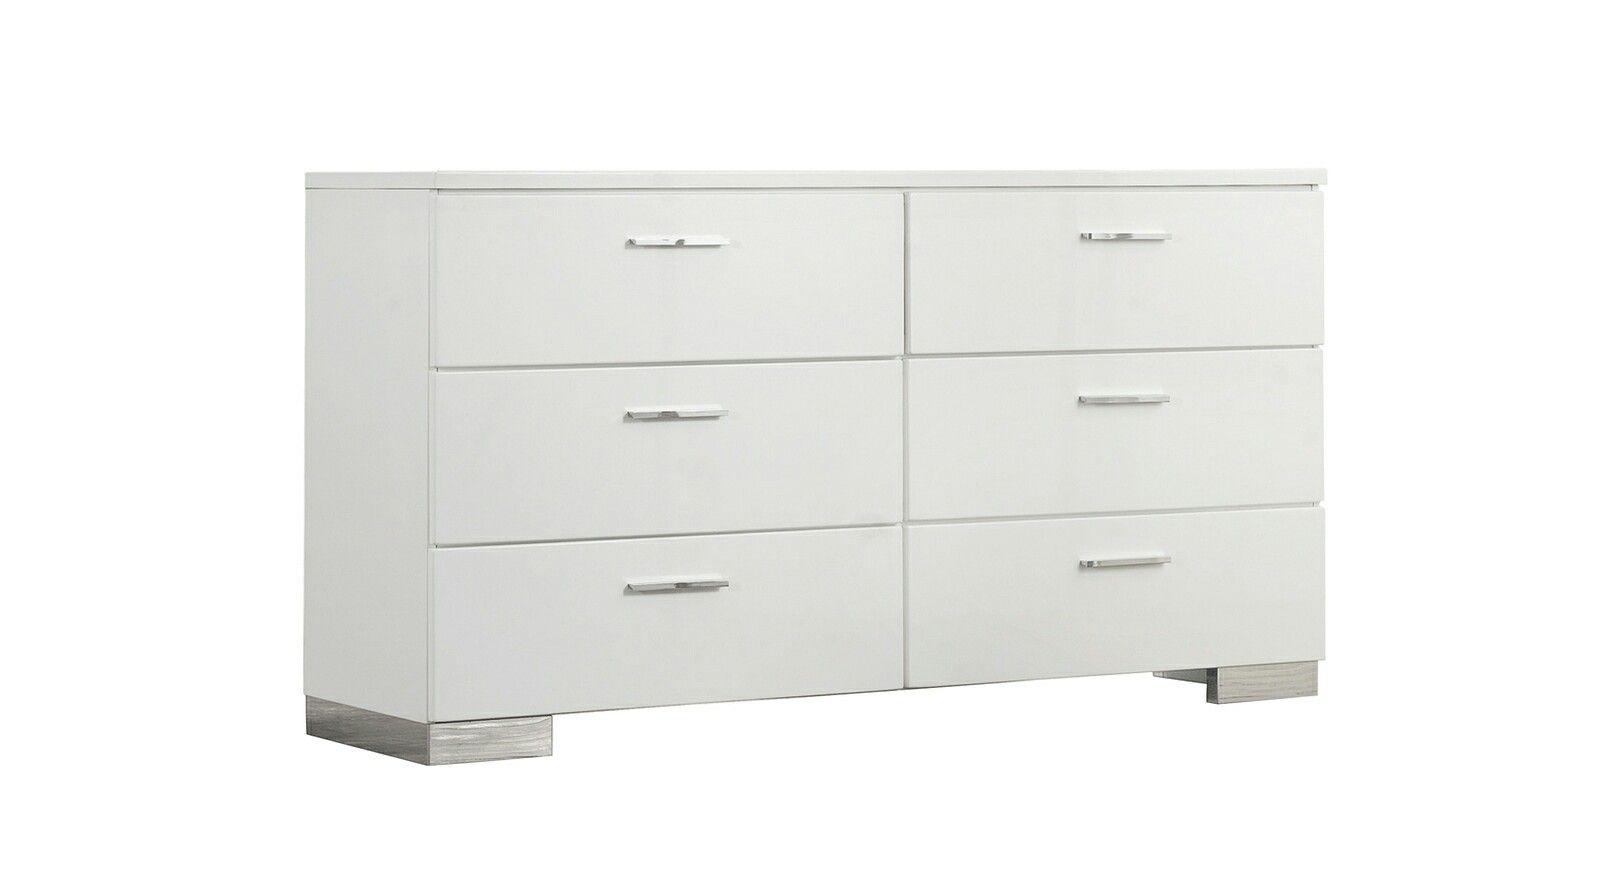 One In Stock Phoebe Glossy Dresser 63 X17 75 X35 25 H Rent 79 Buy 569 Dresser Metal Bar Glossy White